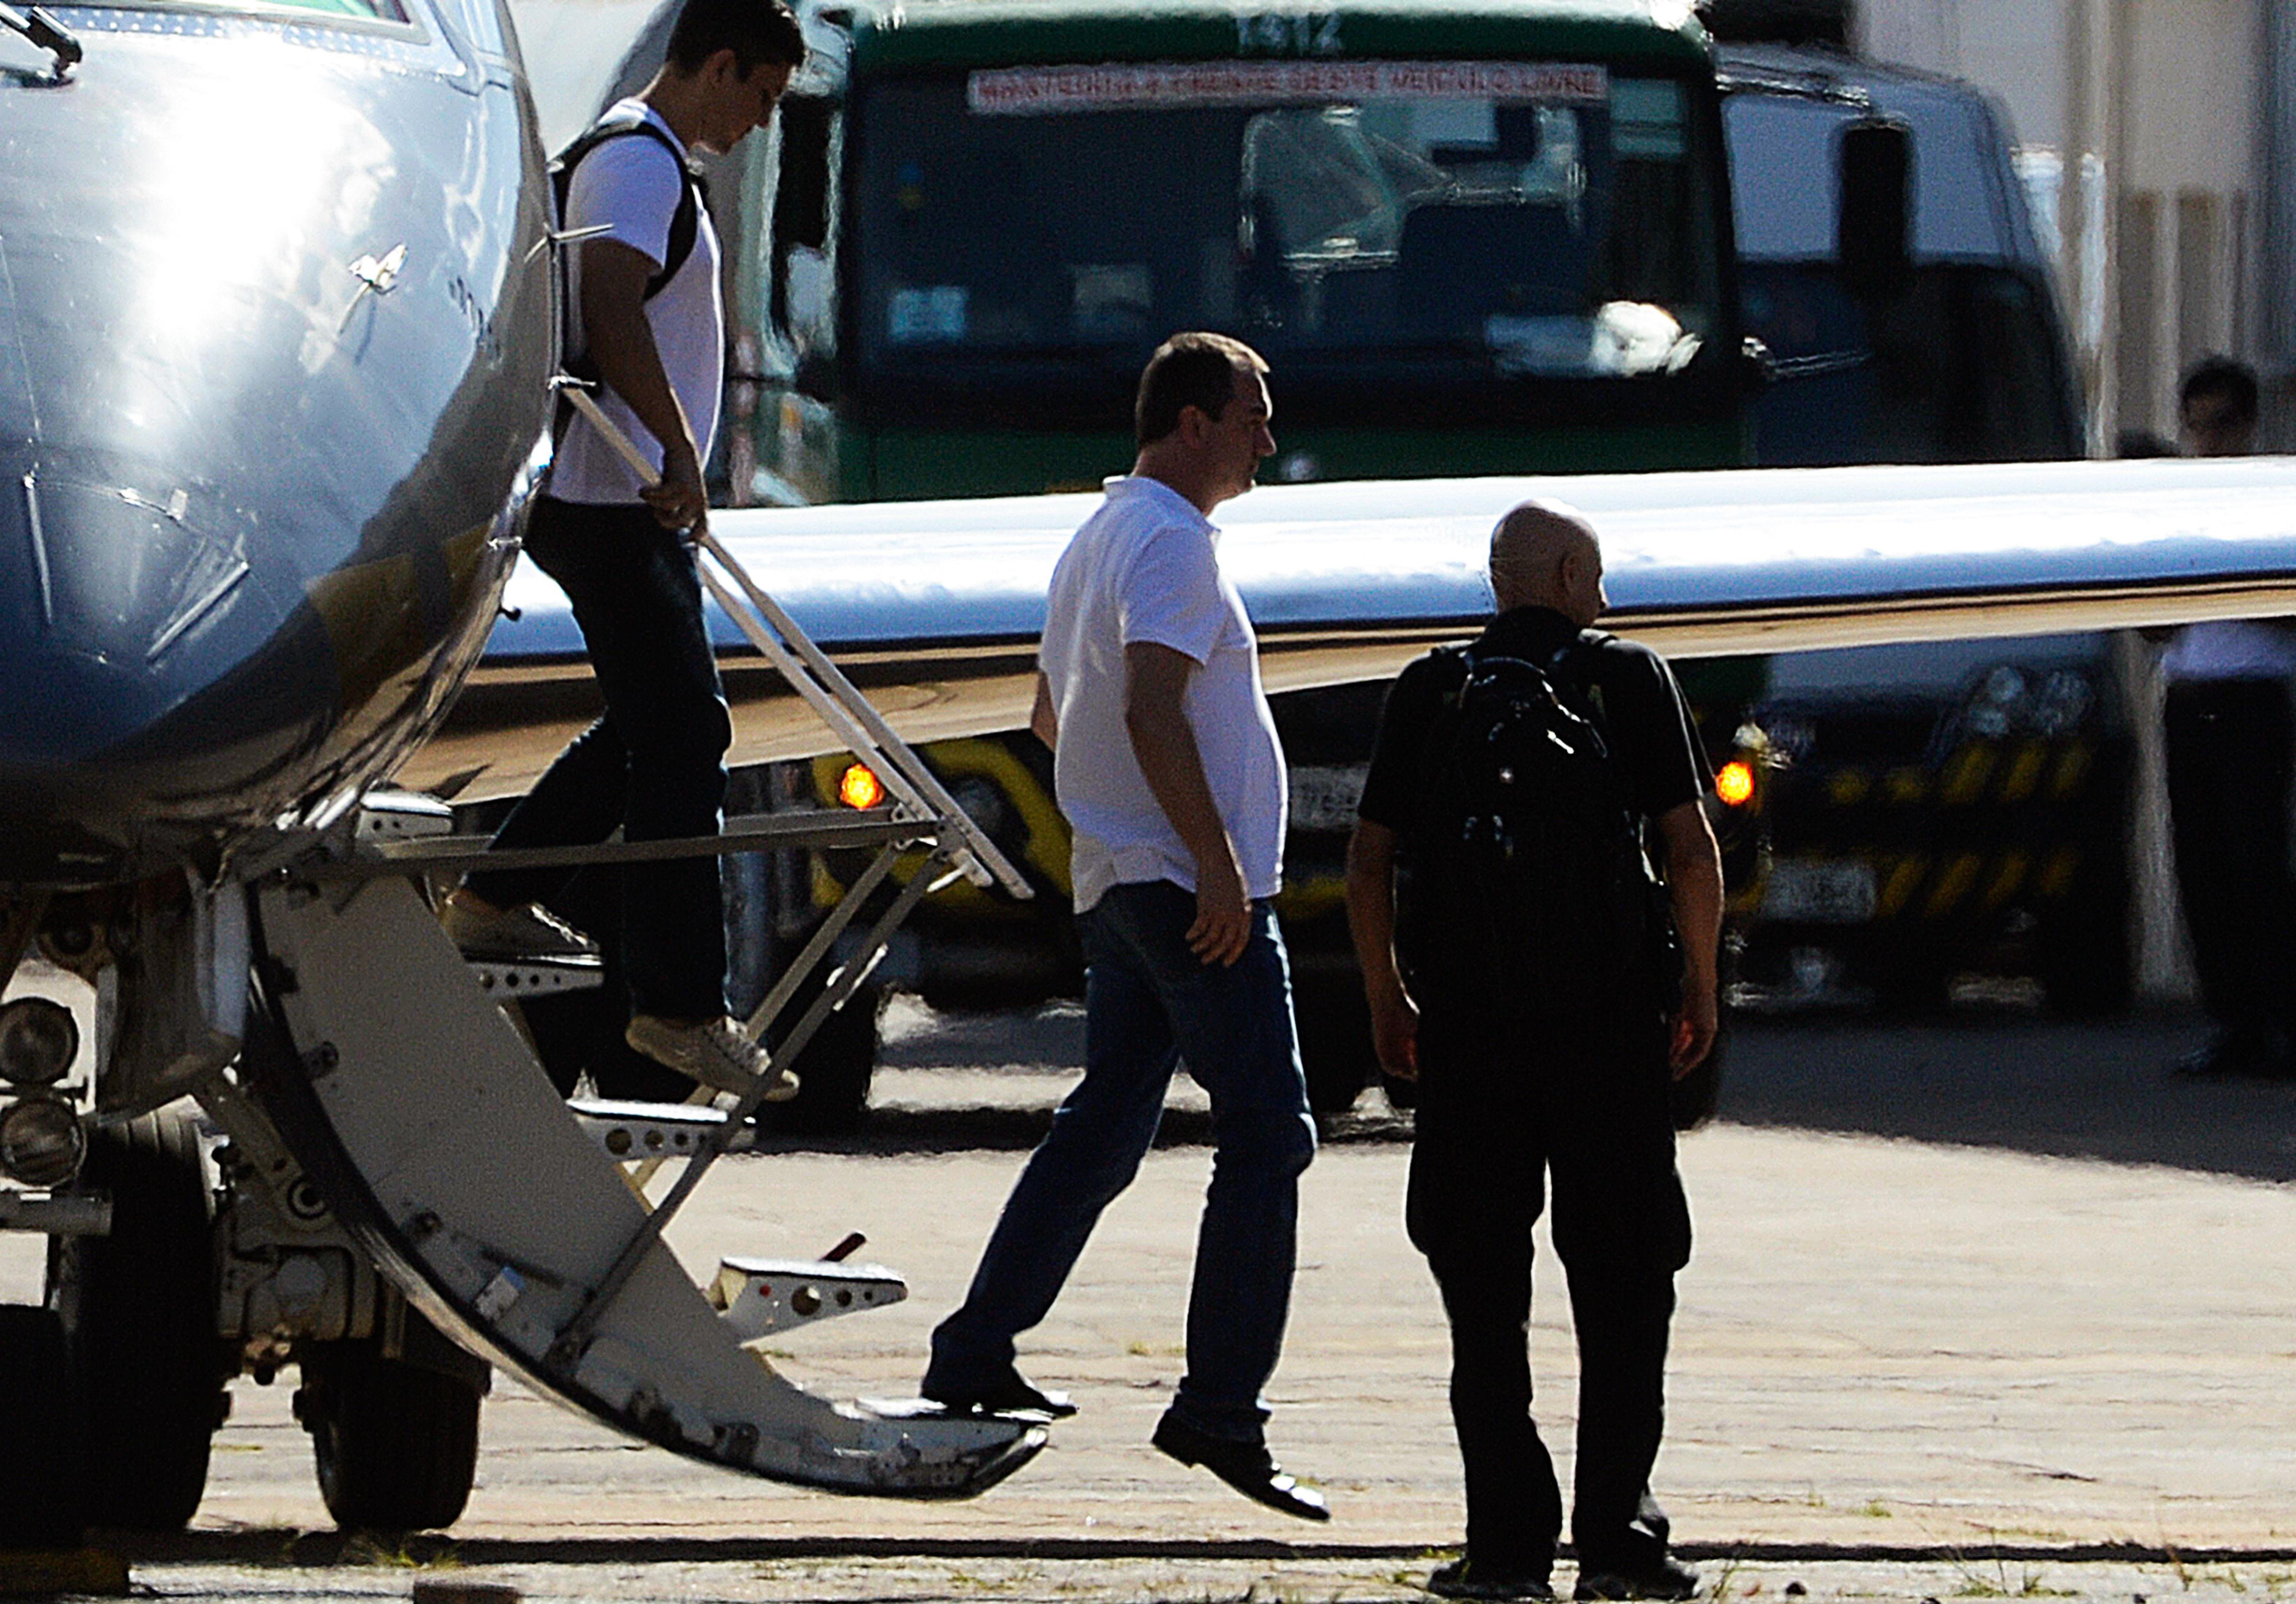 O executivo do grupo J&F, Joesley Batista, desembarca em Brasília onde vai ficar preso na Polícia Federal - Valter Campanato/Agência Brasil